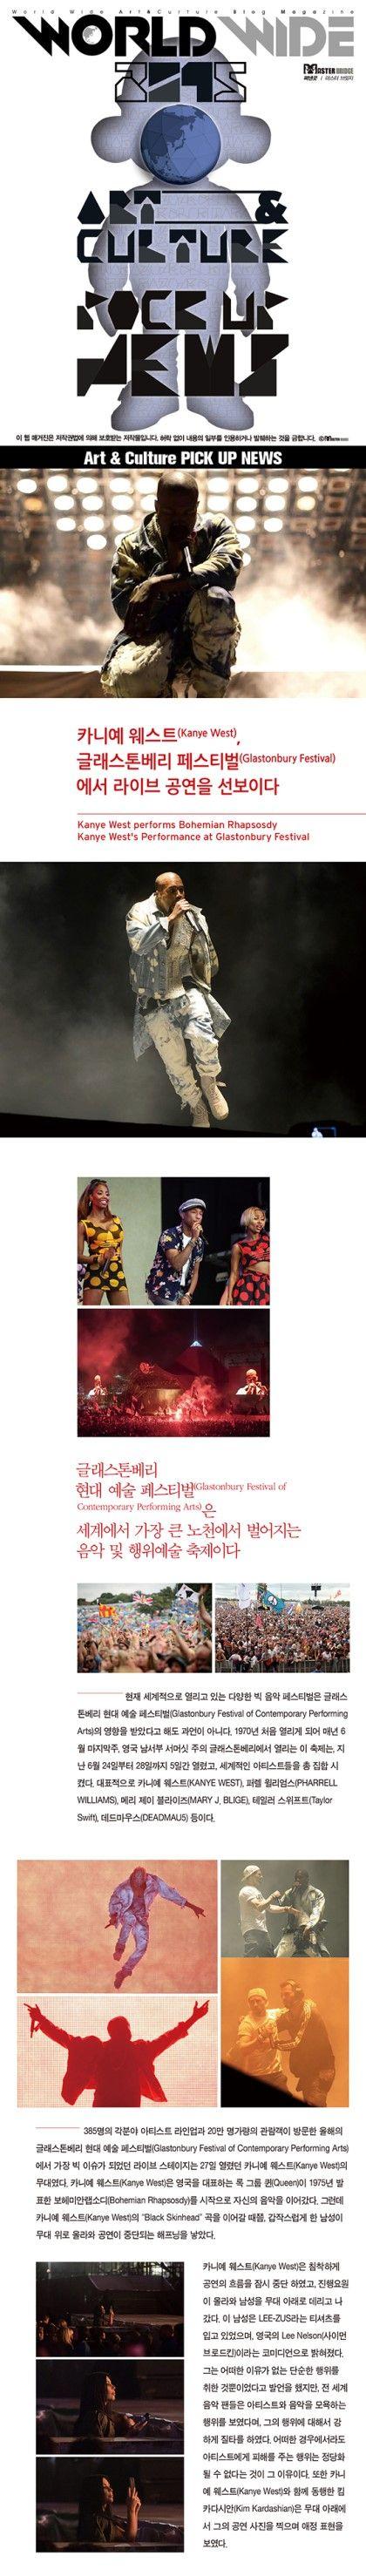 Blog Magazine ● WORLD WIDE: Art & Culture PICK UP NEWS∥카니예 웨스트(Kanye West), 글래스톤베리 페스티벌((Glastonbury Festival)에서 라이브 공연을 선보이다 : 네이버 블로그